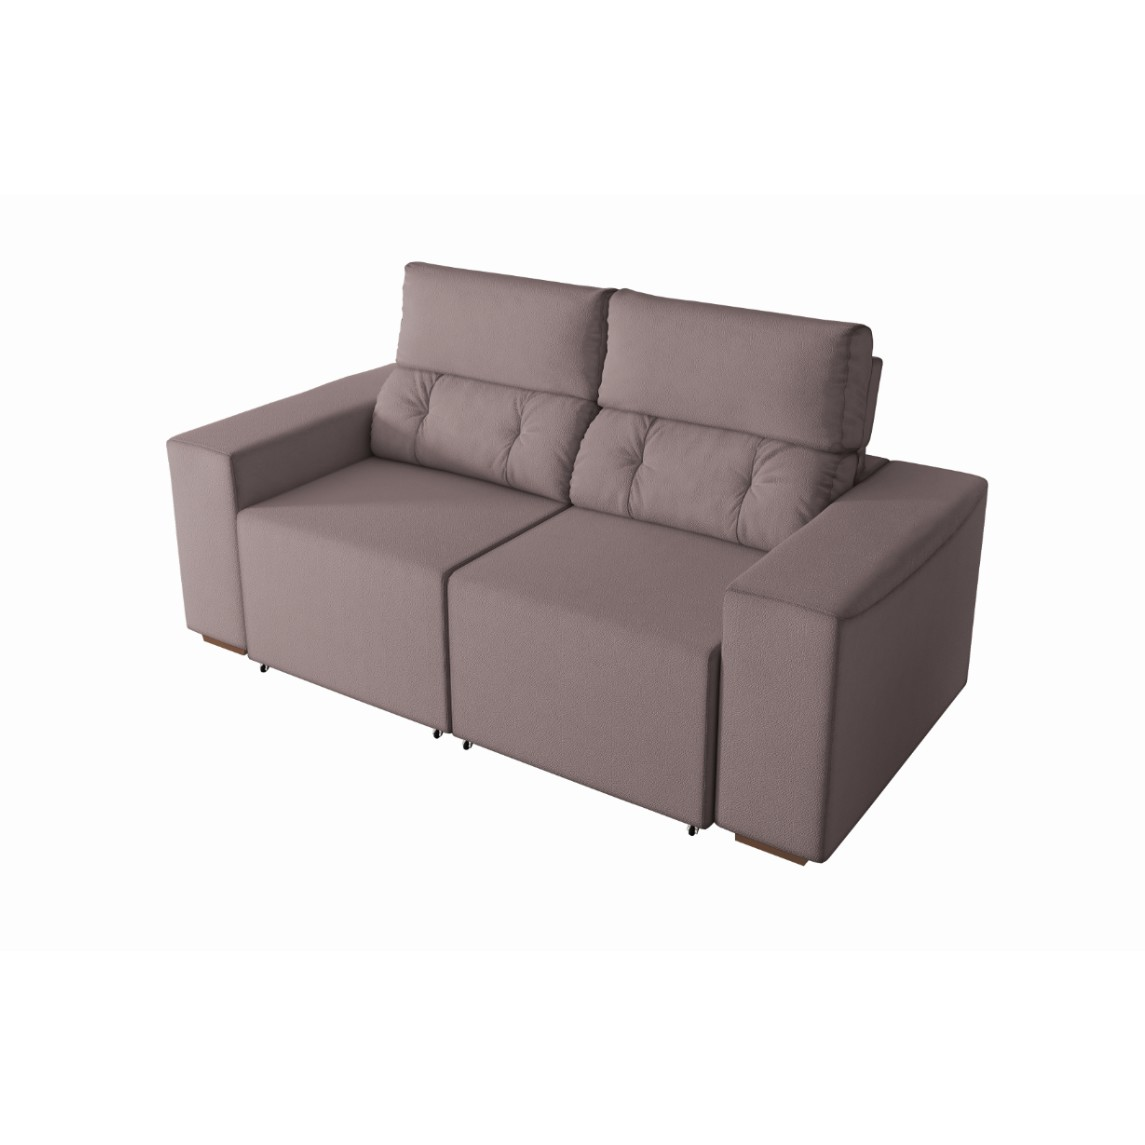 Sofa California 2 Lugares Veludo Marrom Claro - Spazzio